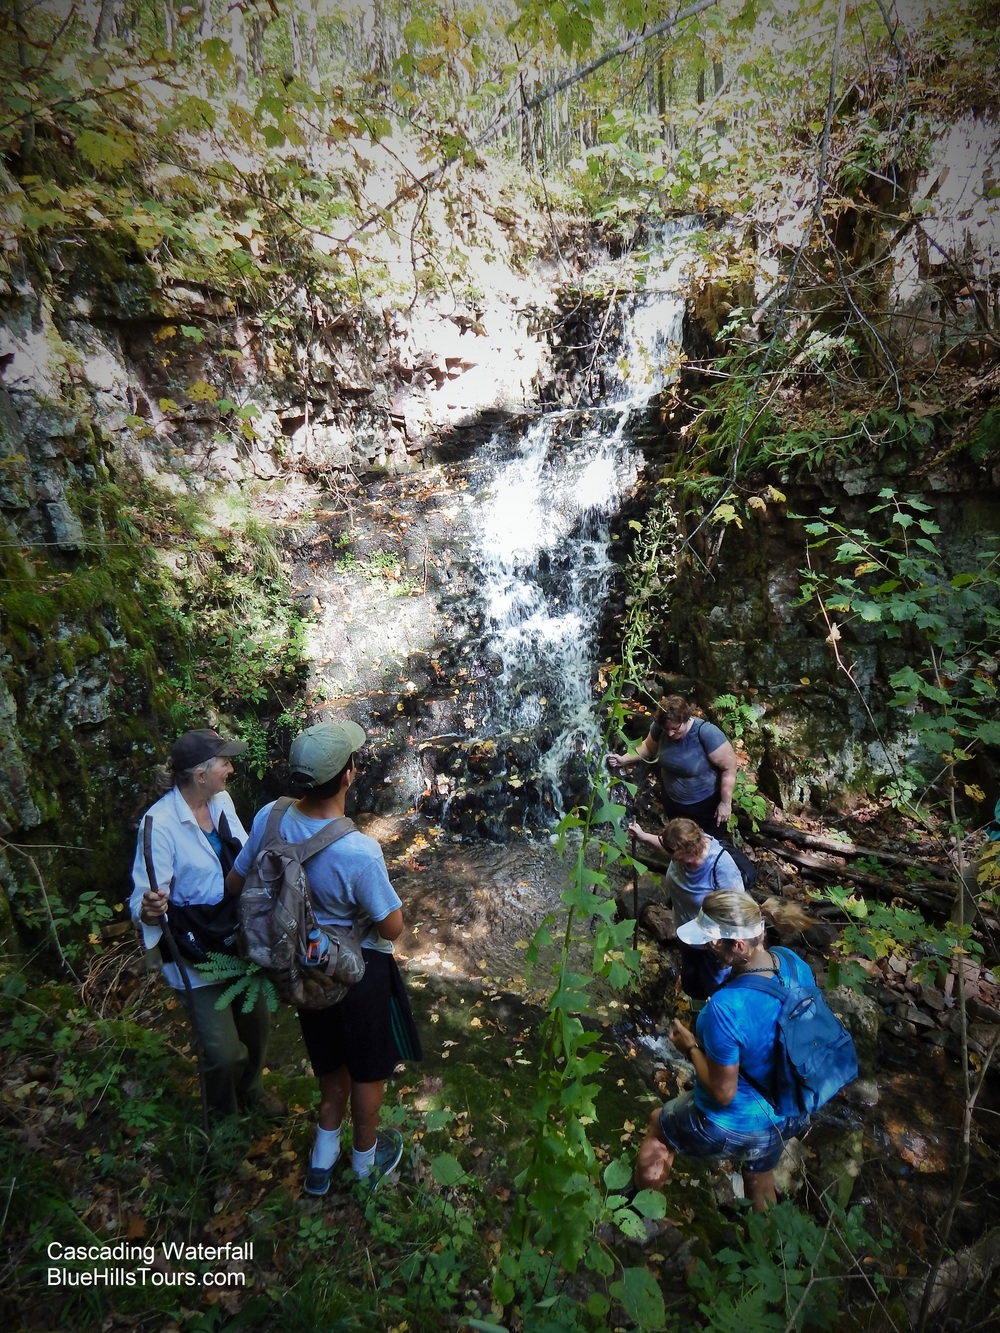 Cascading Waterfall Leaf It 2015.jpg